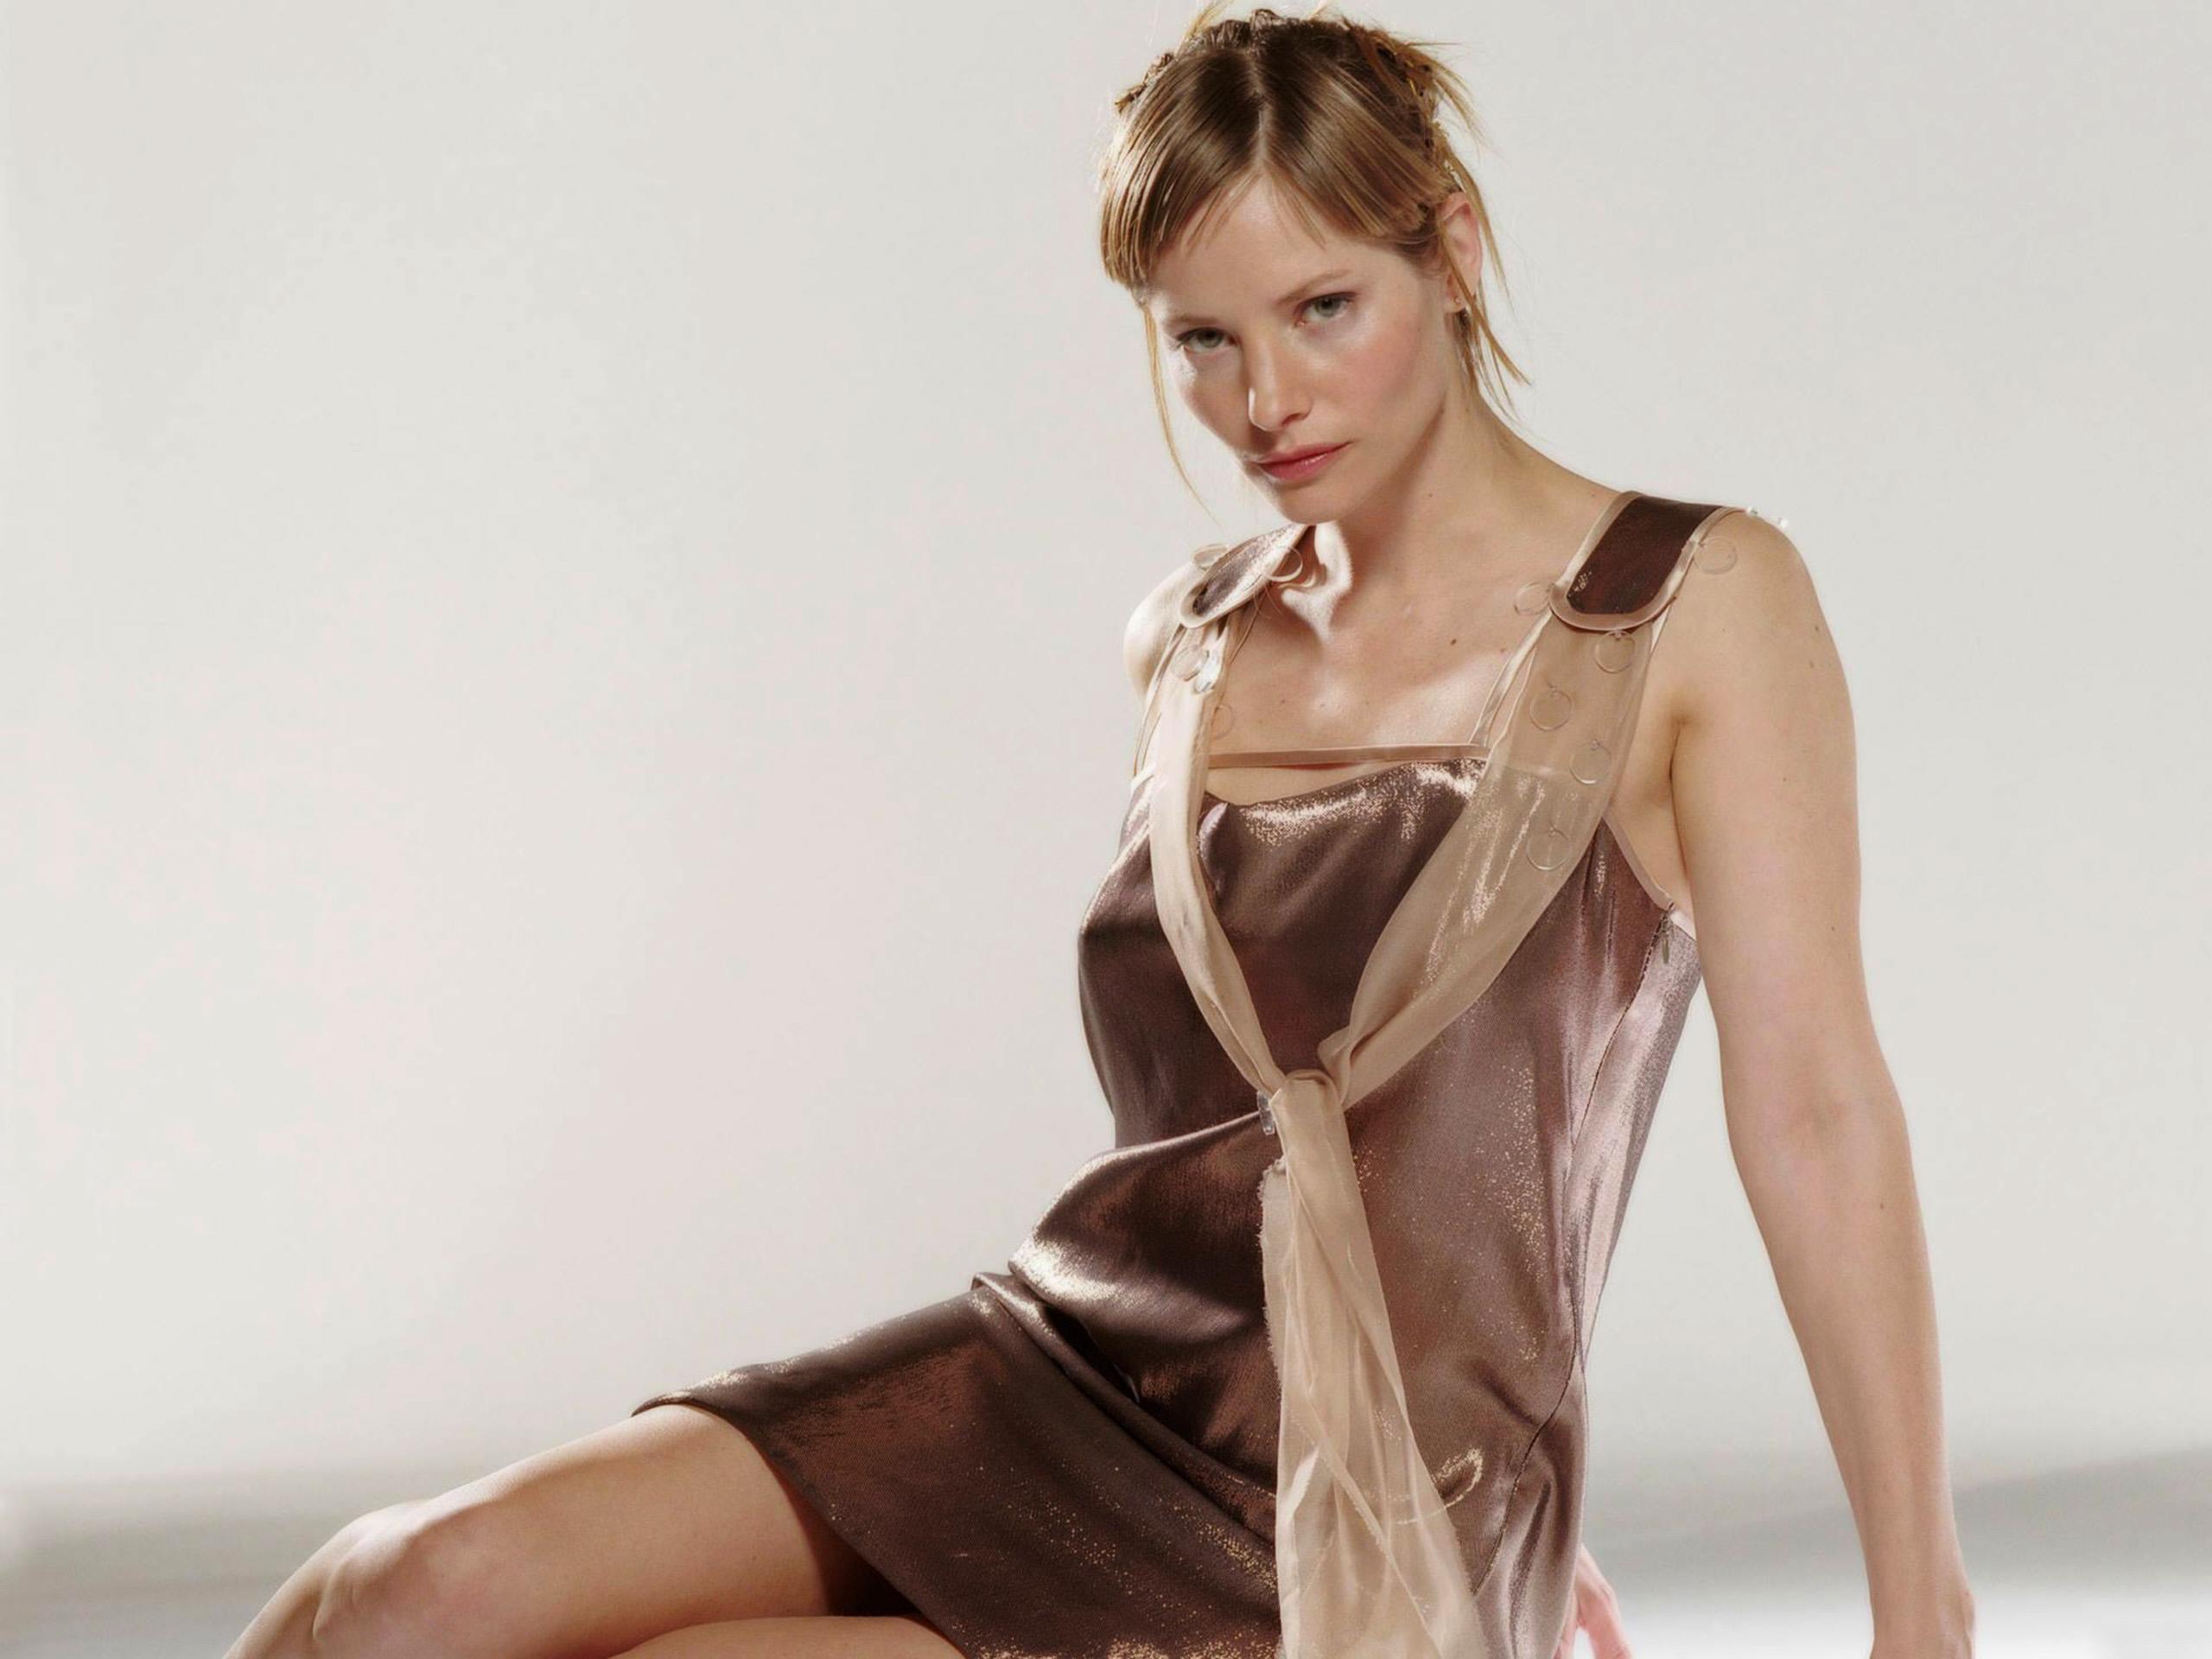 Resident evil 2 nude ada wongmod cutscene - 2 6